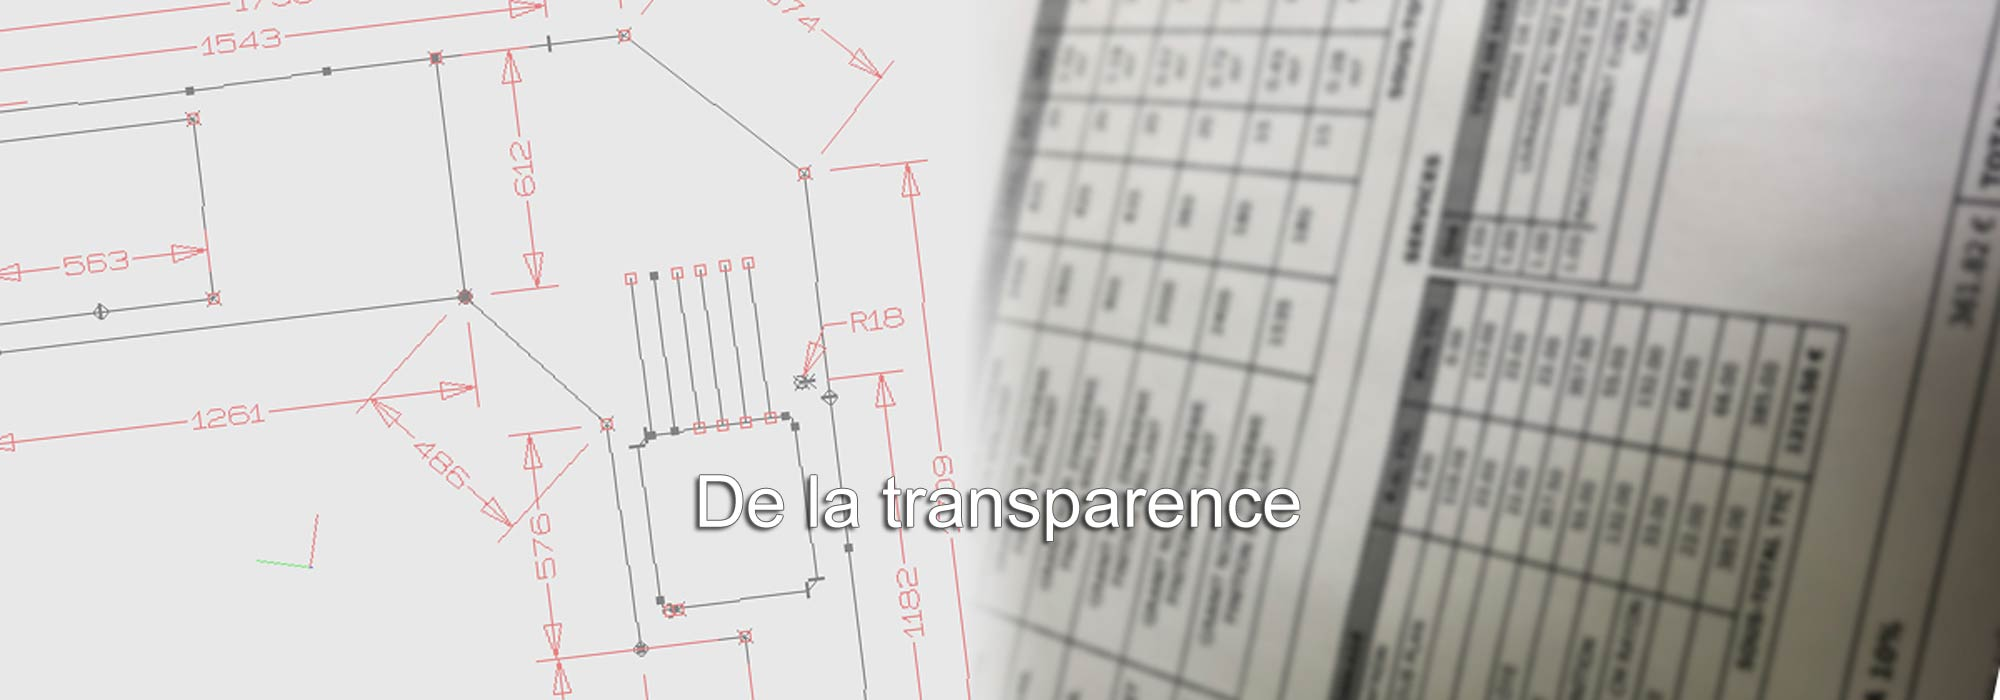 De la transparence